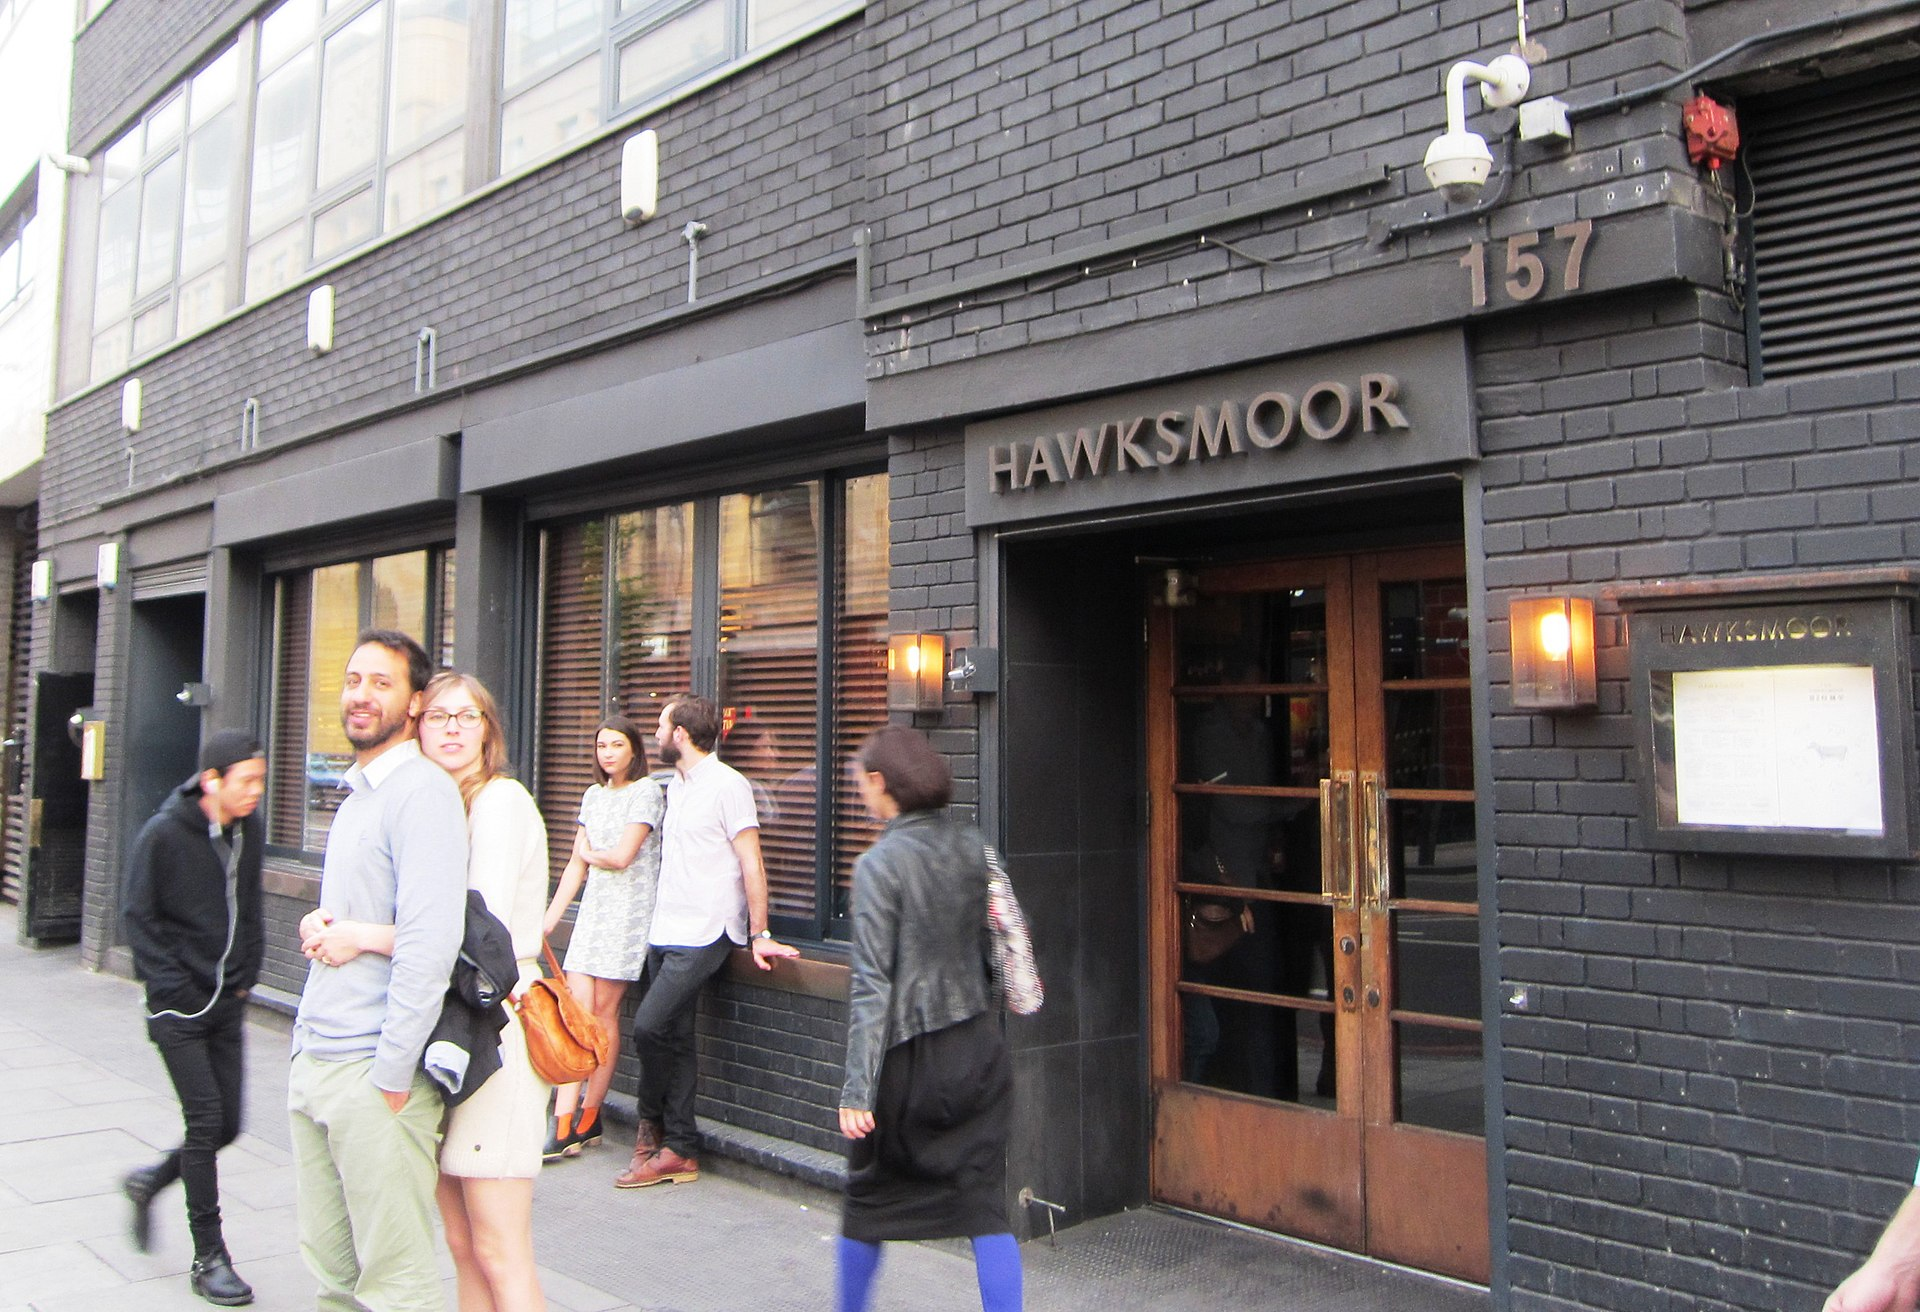 Hawksmoor restaurant  Wikipedia